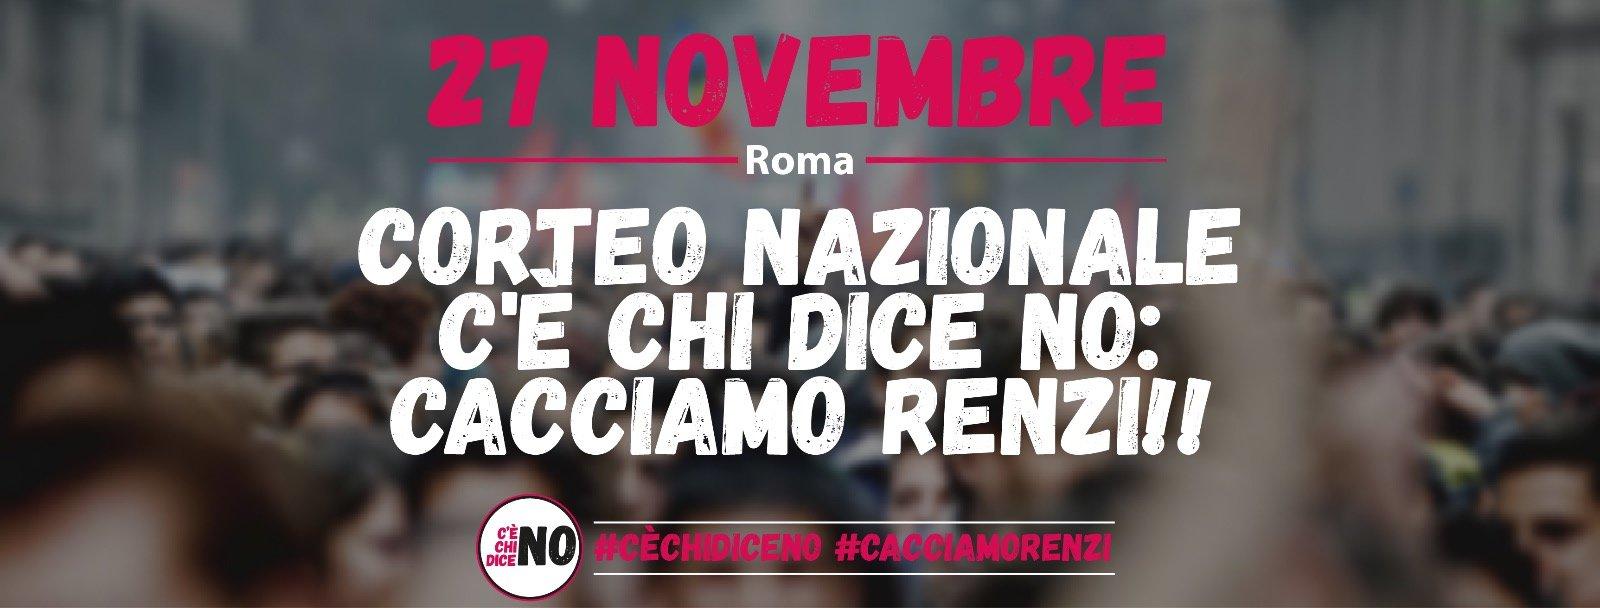 """C'è chi dice no!"" – Report assemblea nazionale del 1 ottobre"